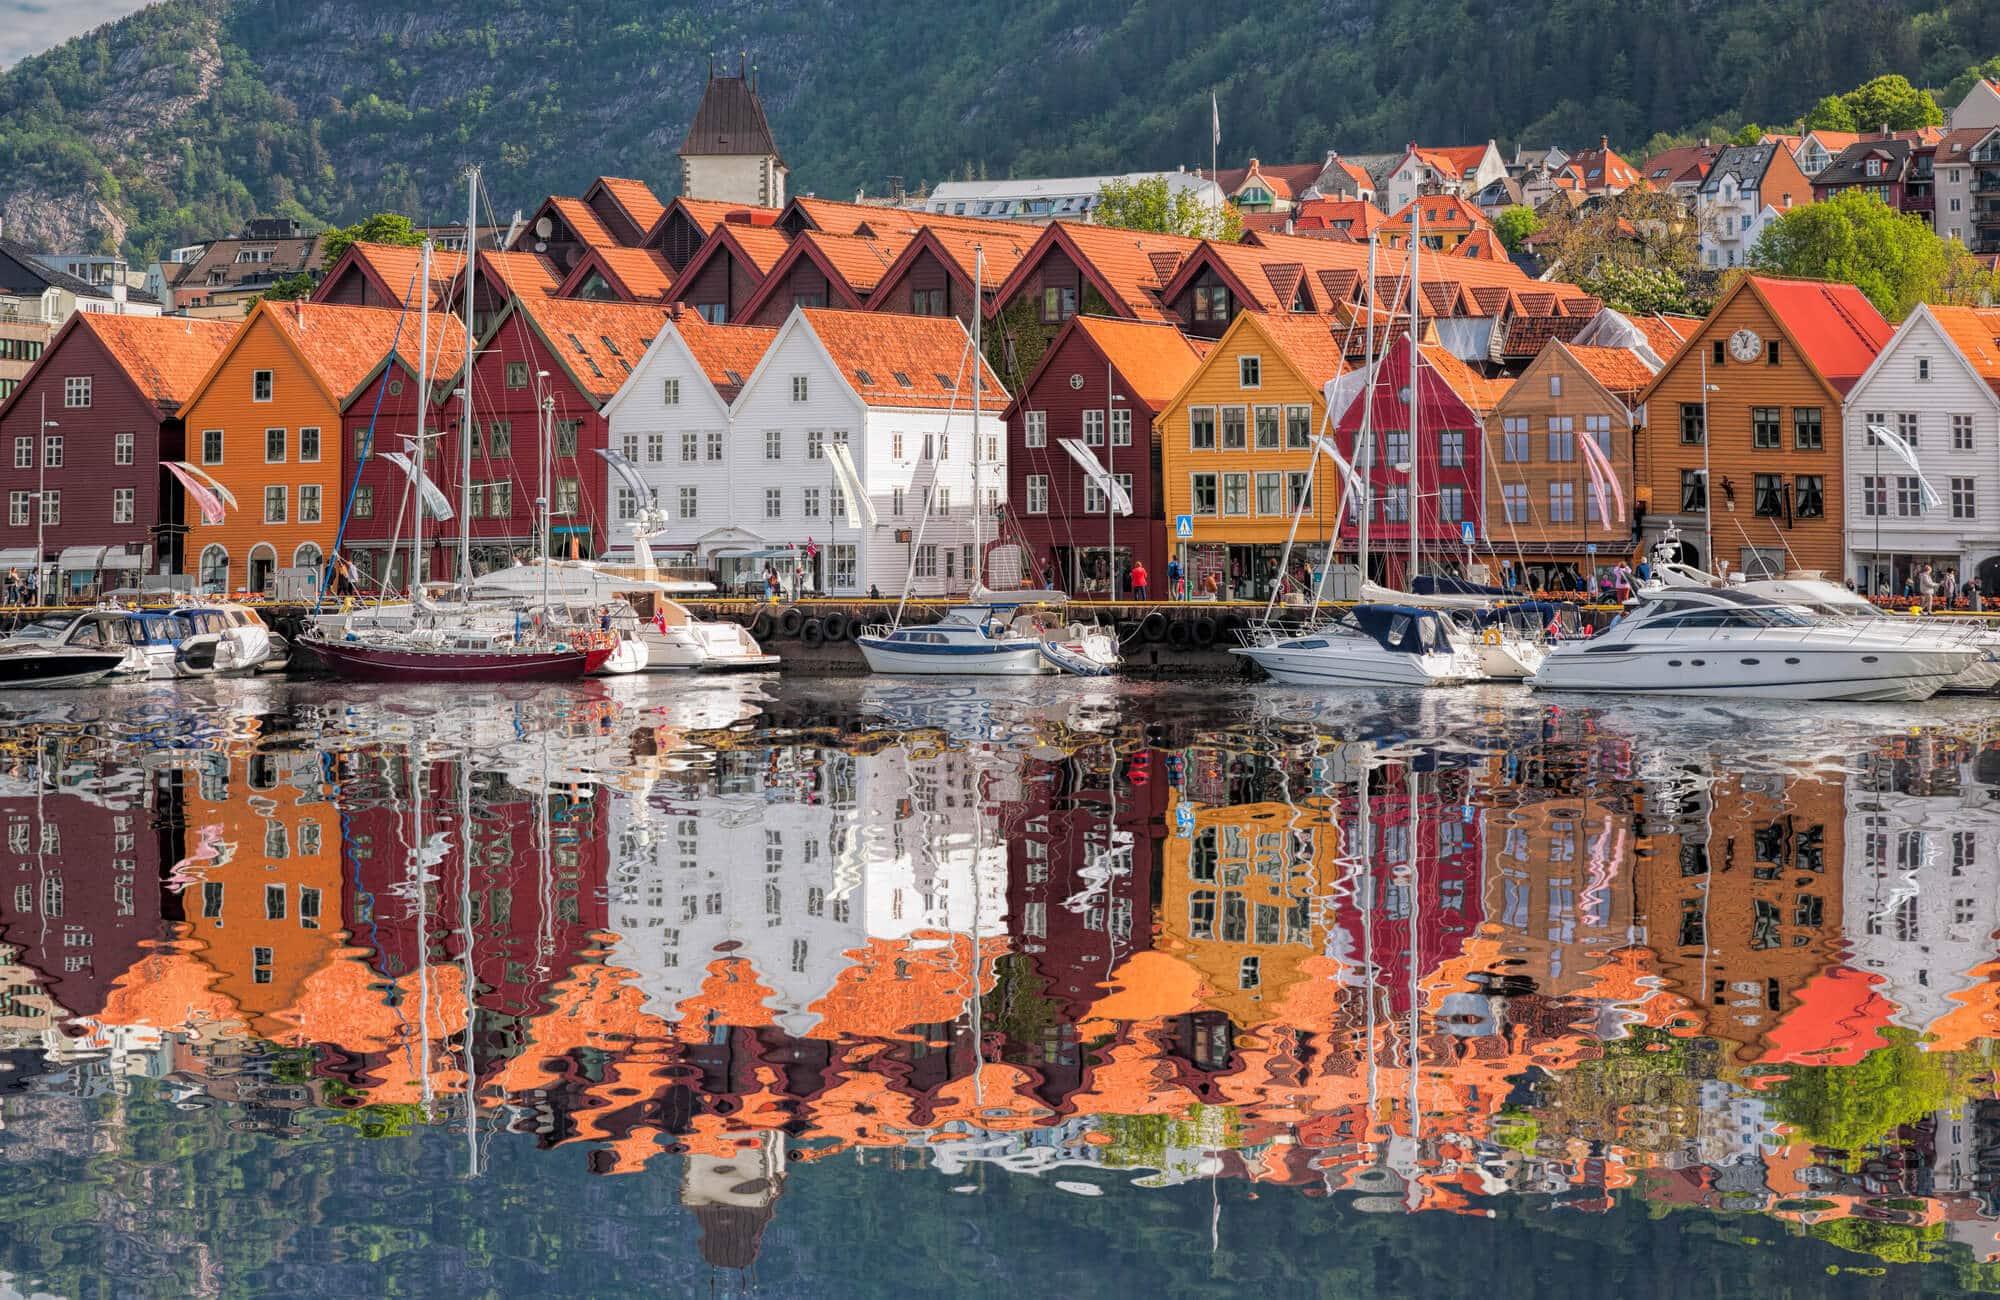 UNESCO World Heritage Listed Bryggen i Bergen (medieval wharfs) #bucketlist #travelinspo #norway #bergen